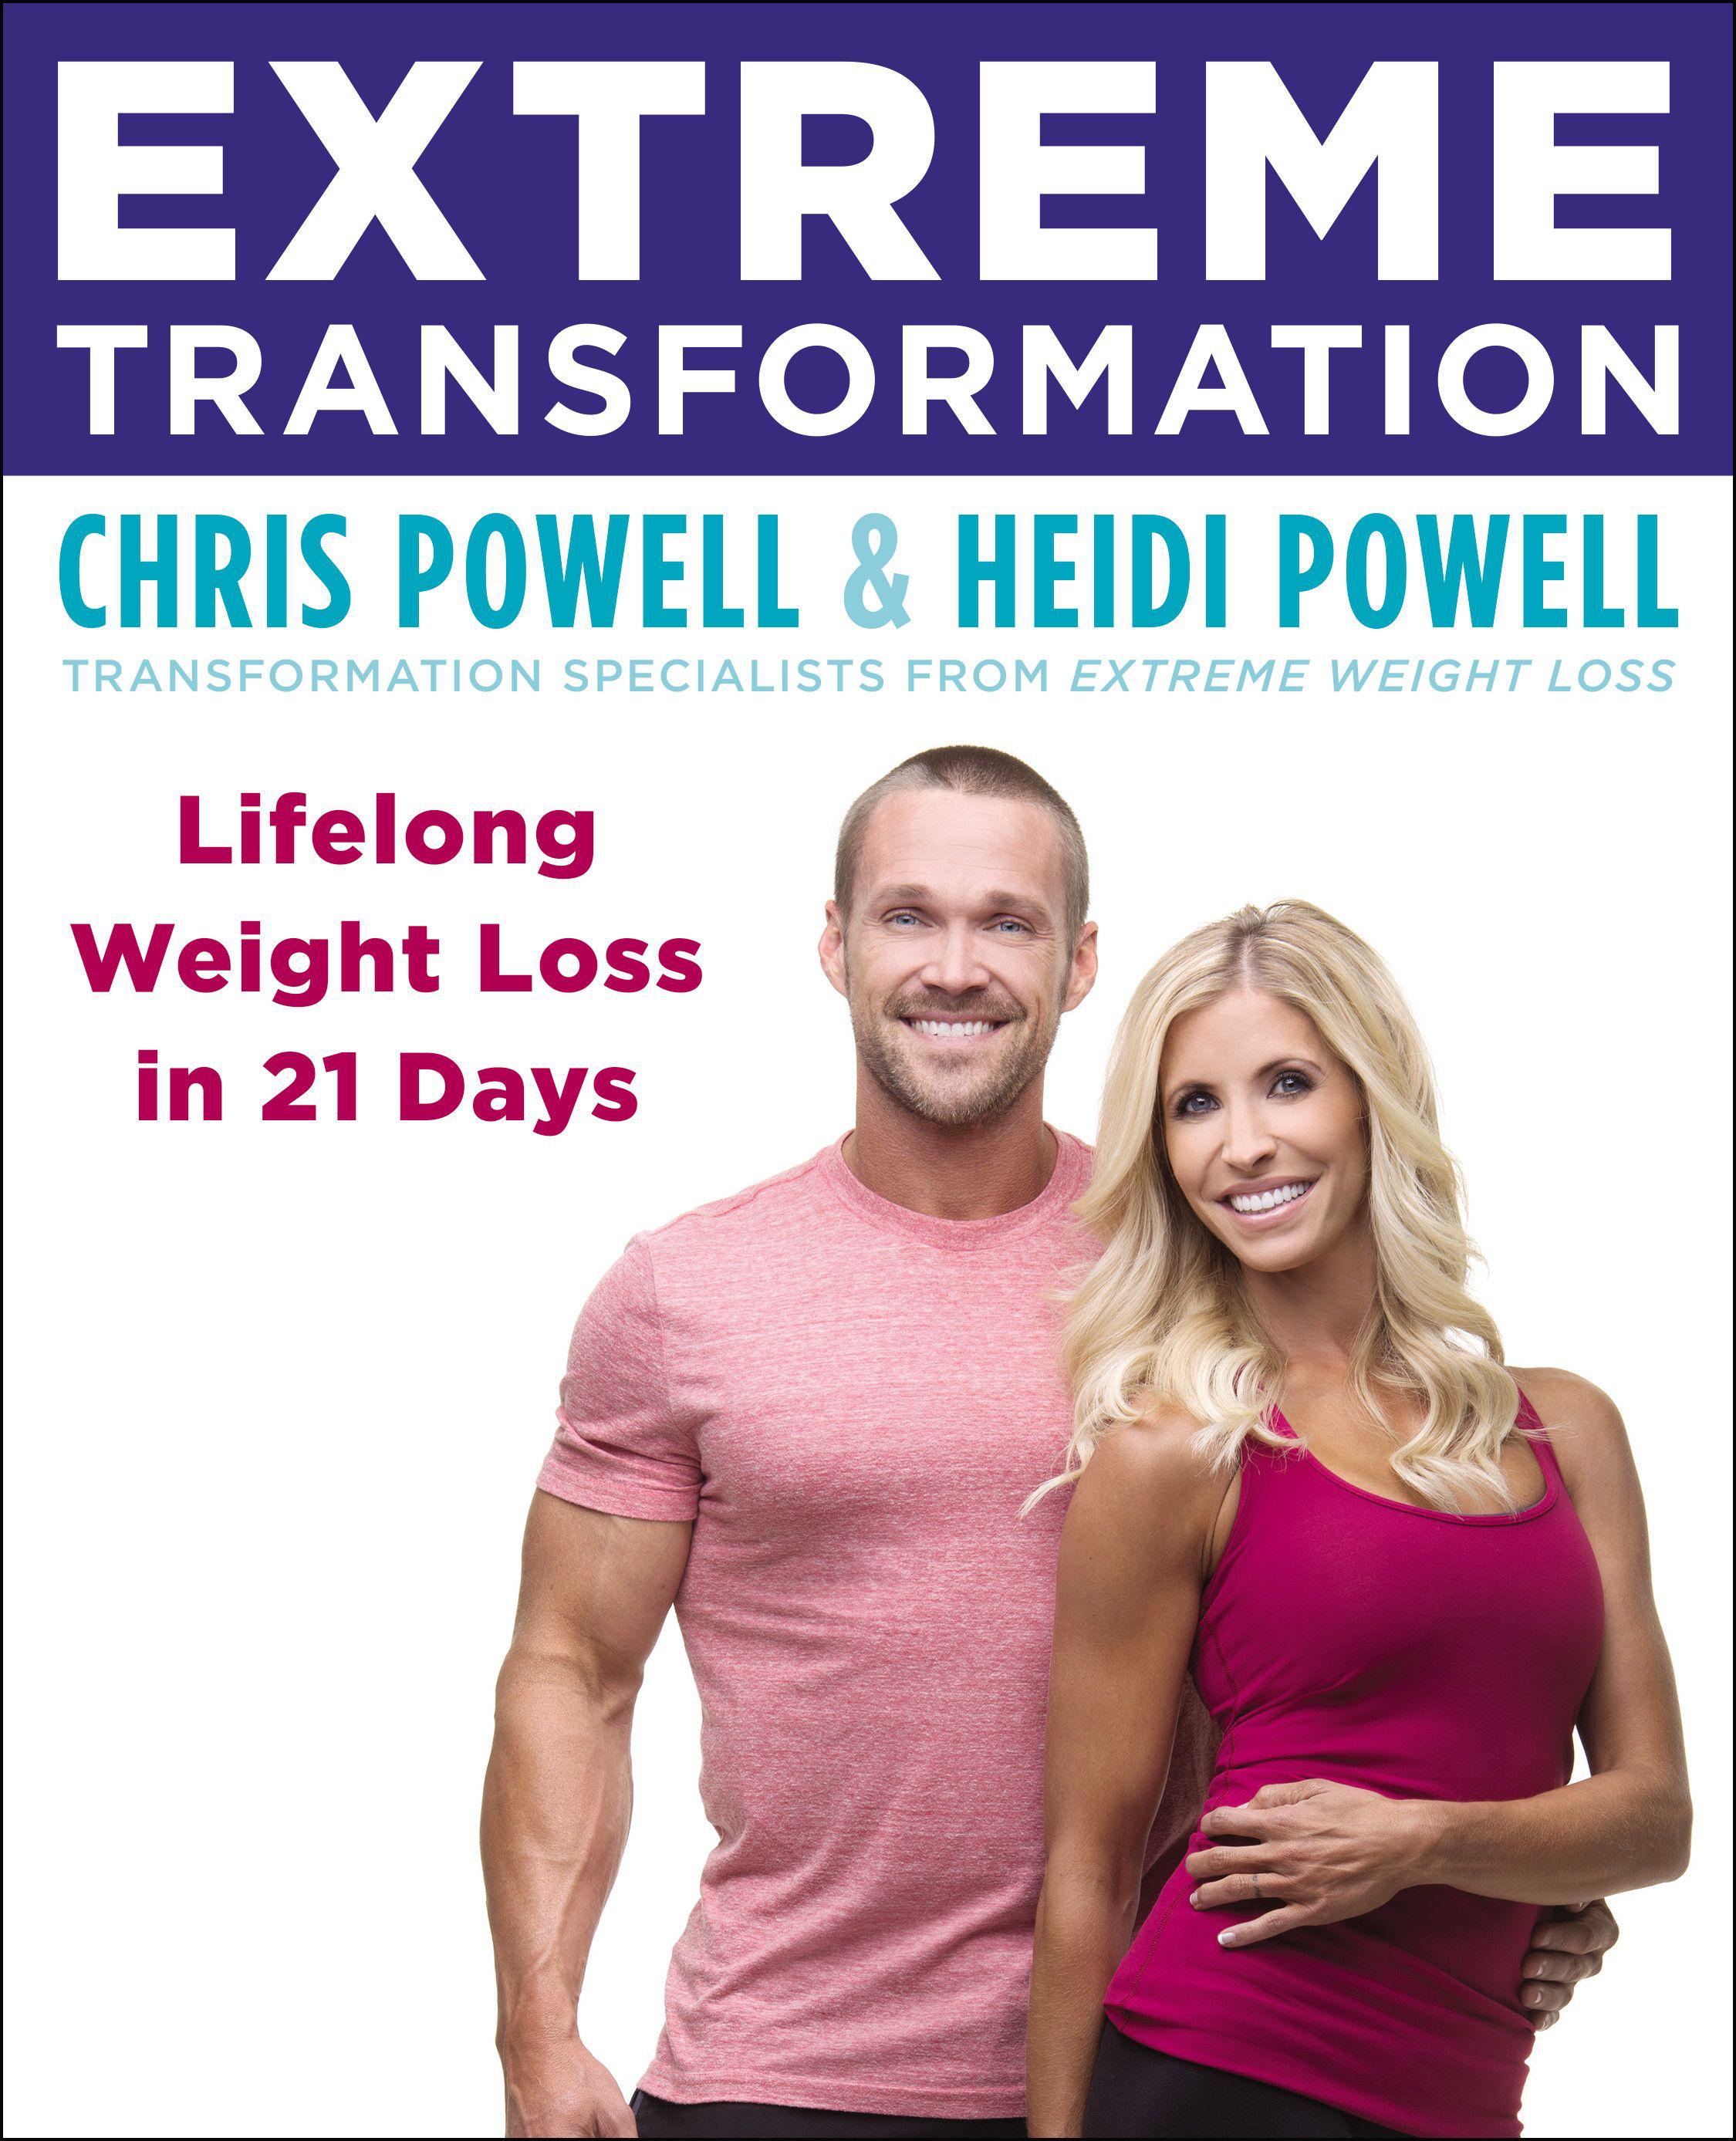 Whole30 Diet Sample Plan